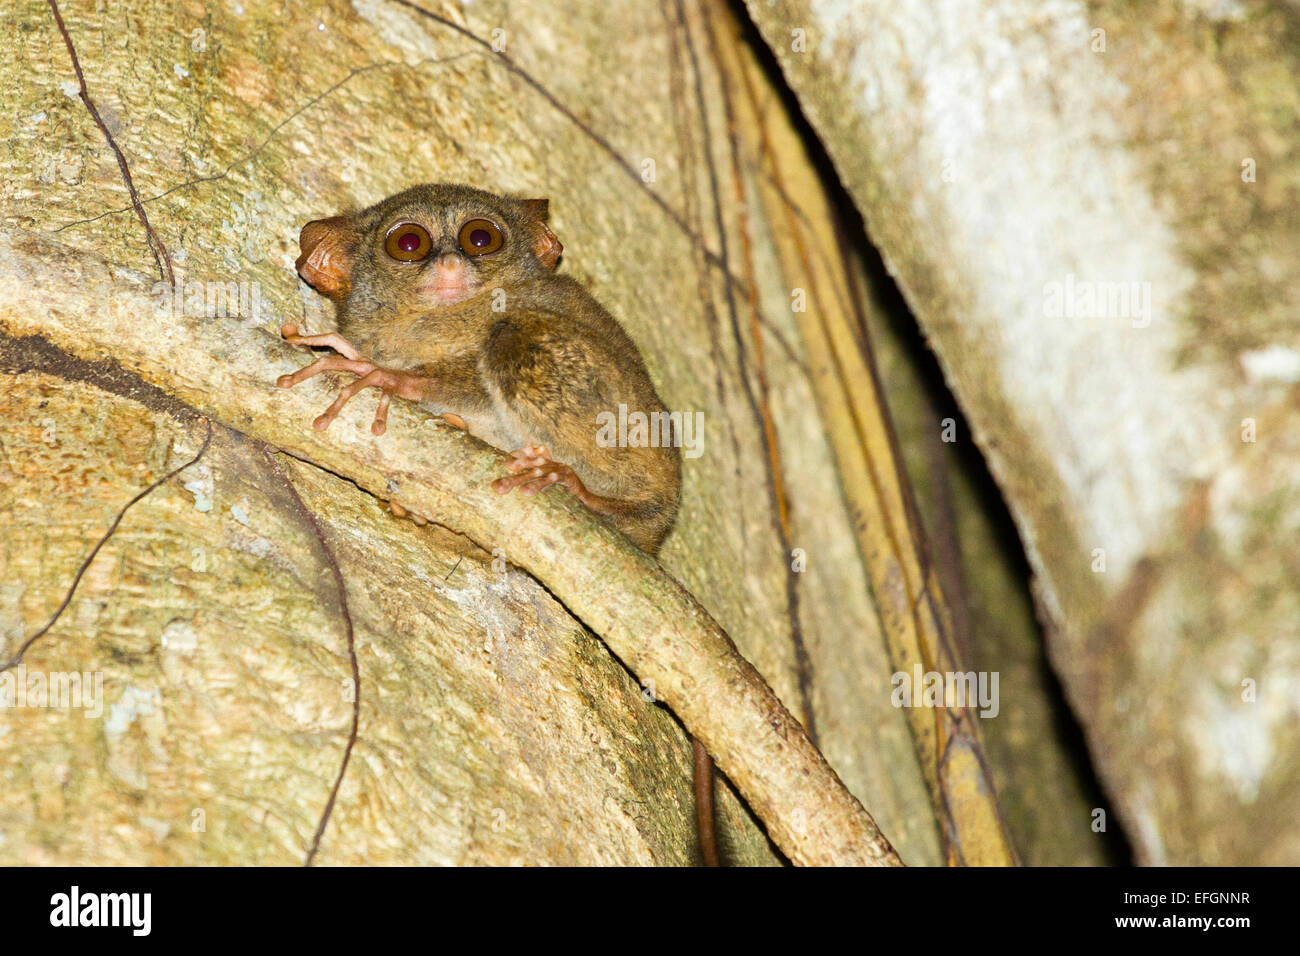 Spectral tarsier - Tarsius tarsier, Tangkoko Nature Reserve, North Sulawesi, Indonesia - Stock Image